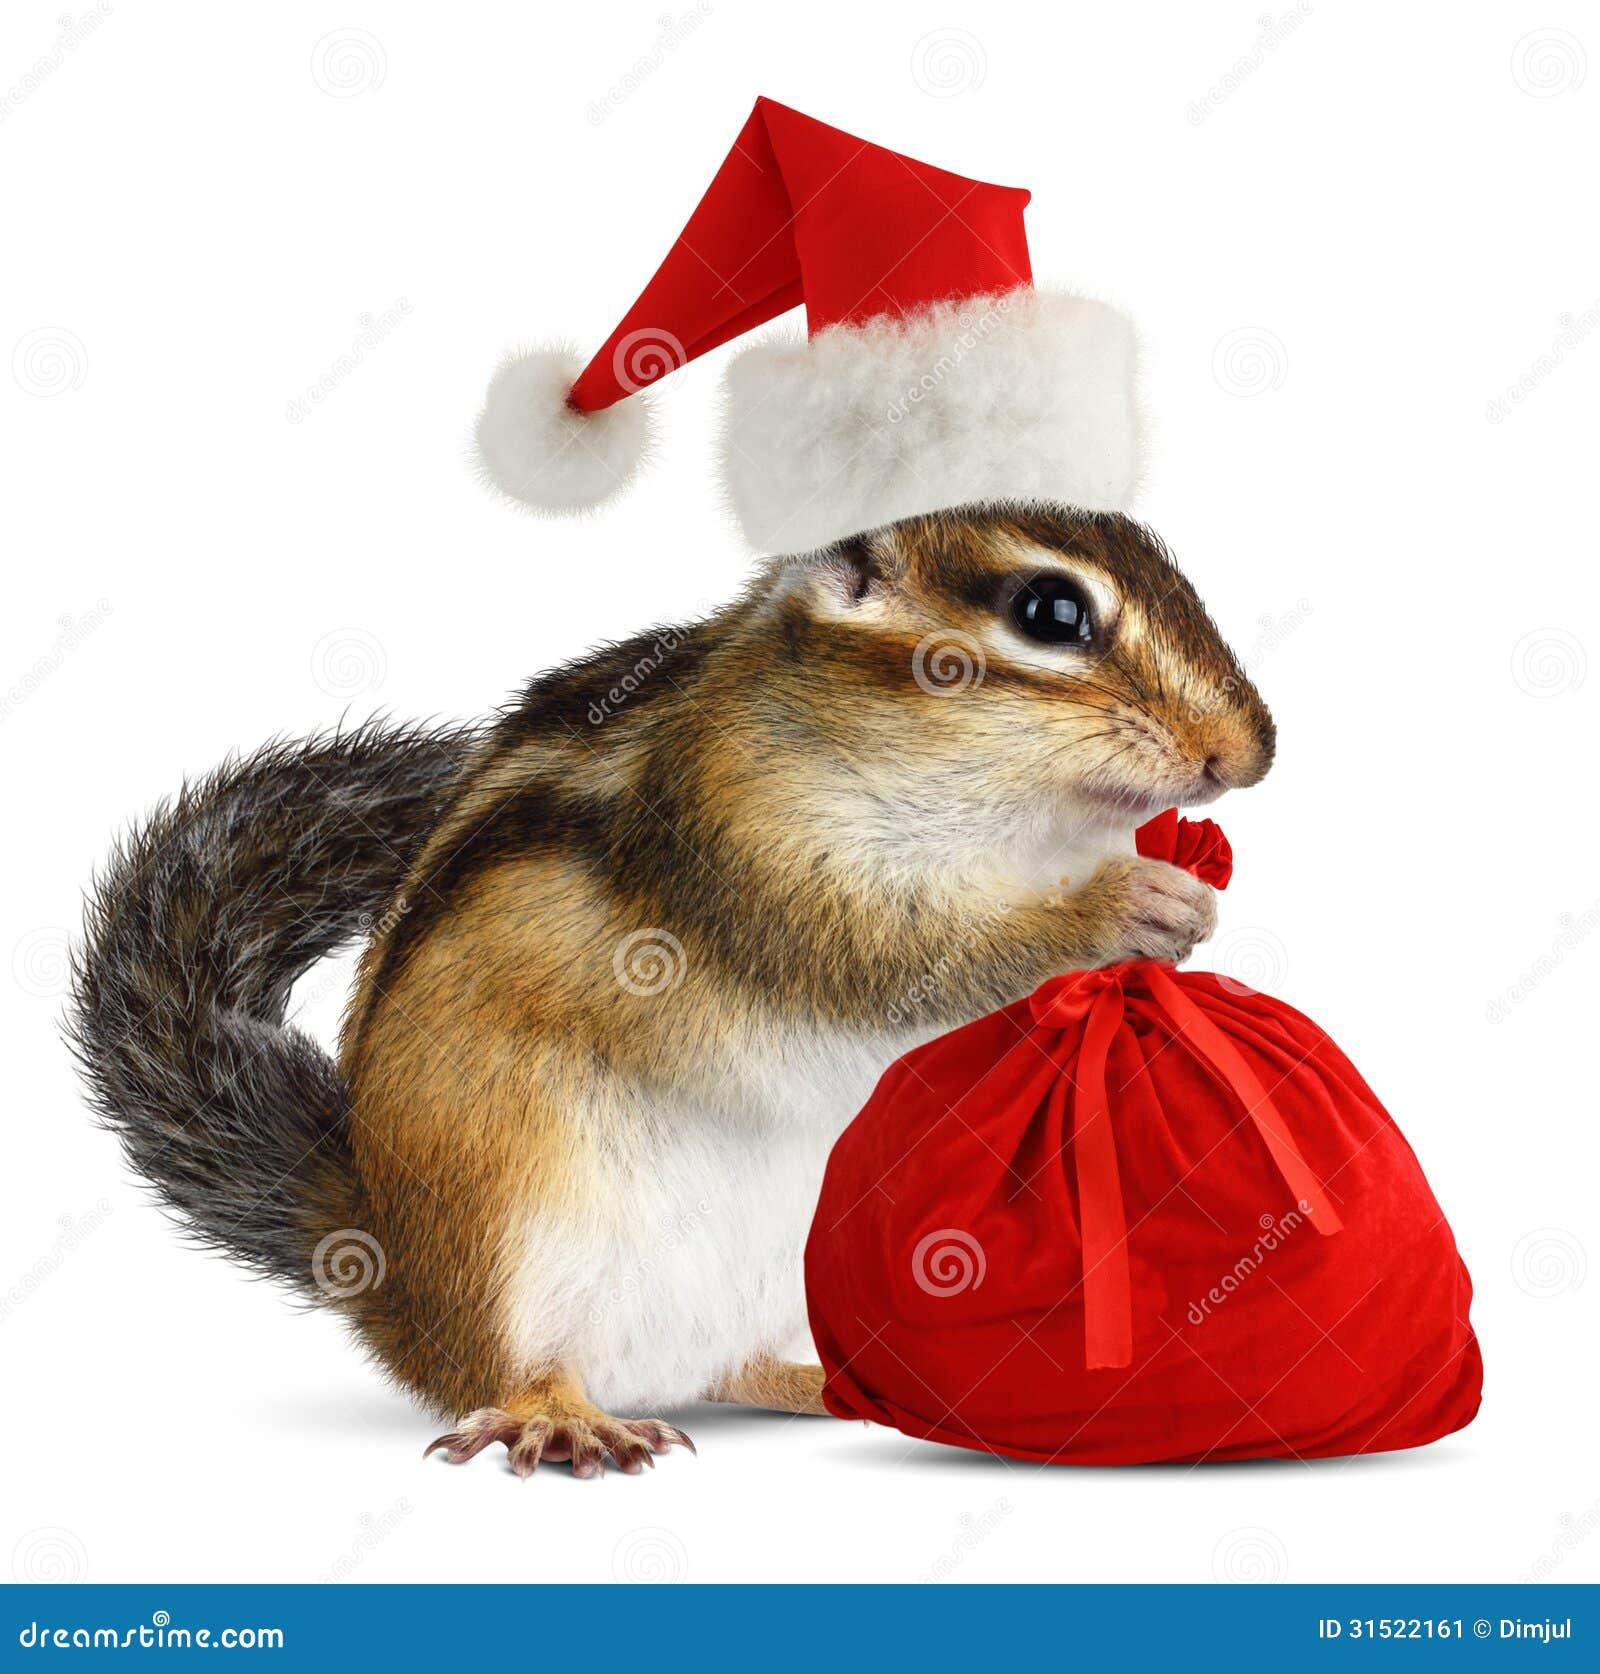 Chipmunk In Red Santa Claus Hat With Santas Bag Stock Image - Image ...